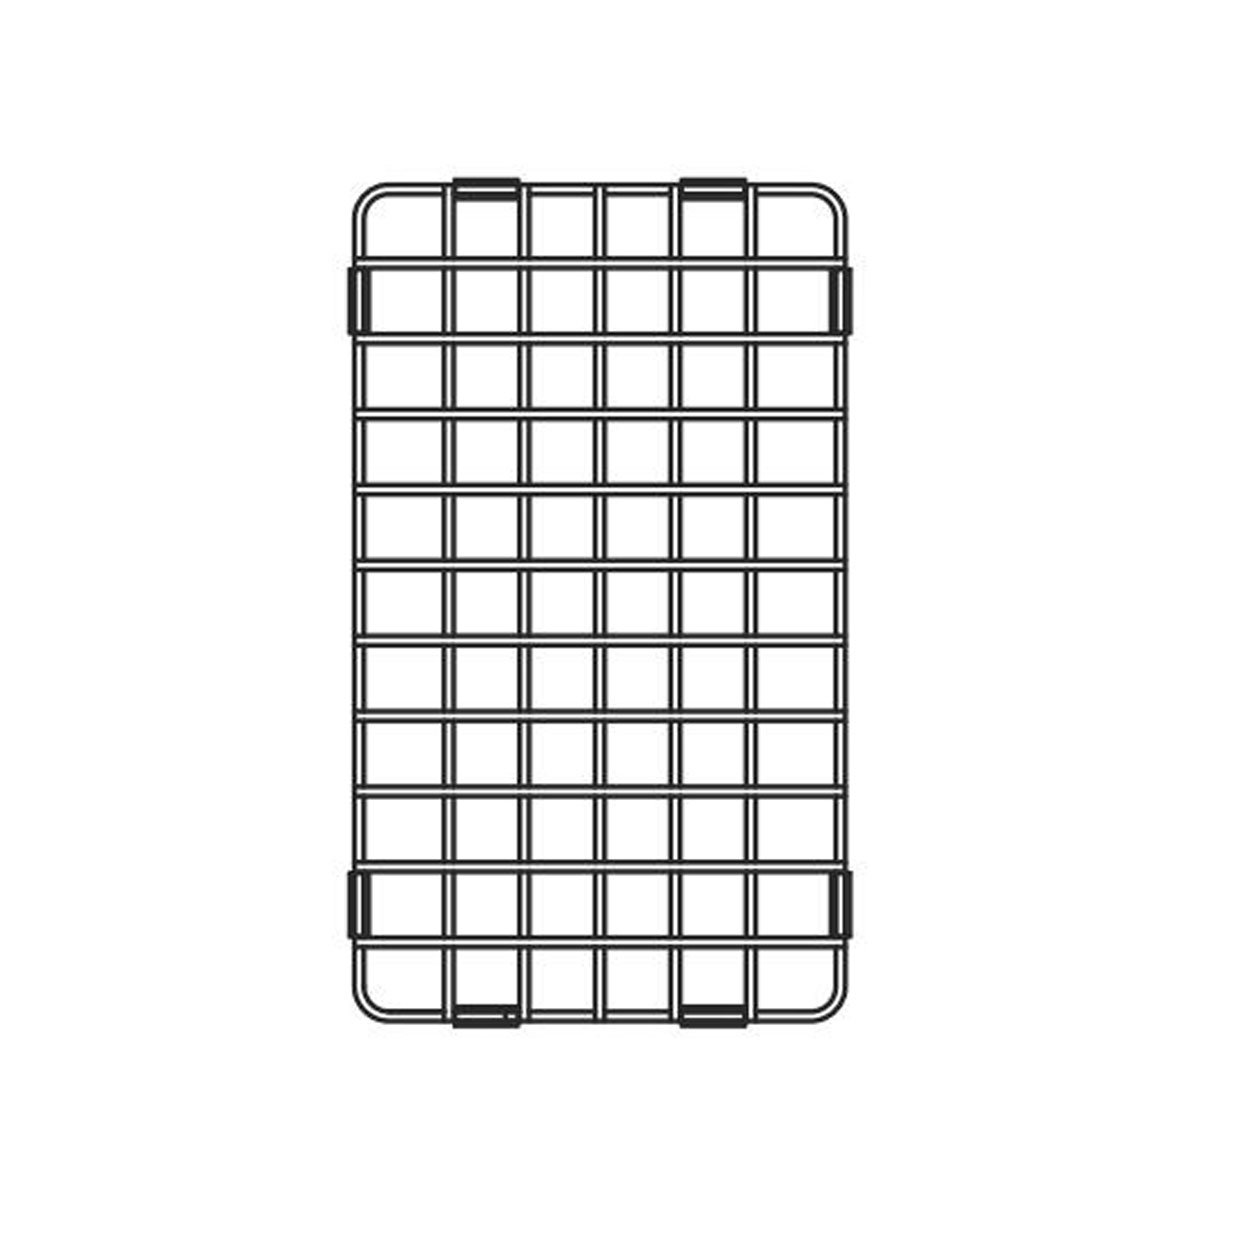 Franke CE19-31S  Centinox Kitchen Sink Bottom Grid by Franke